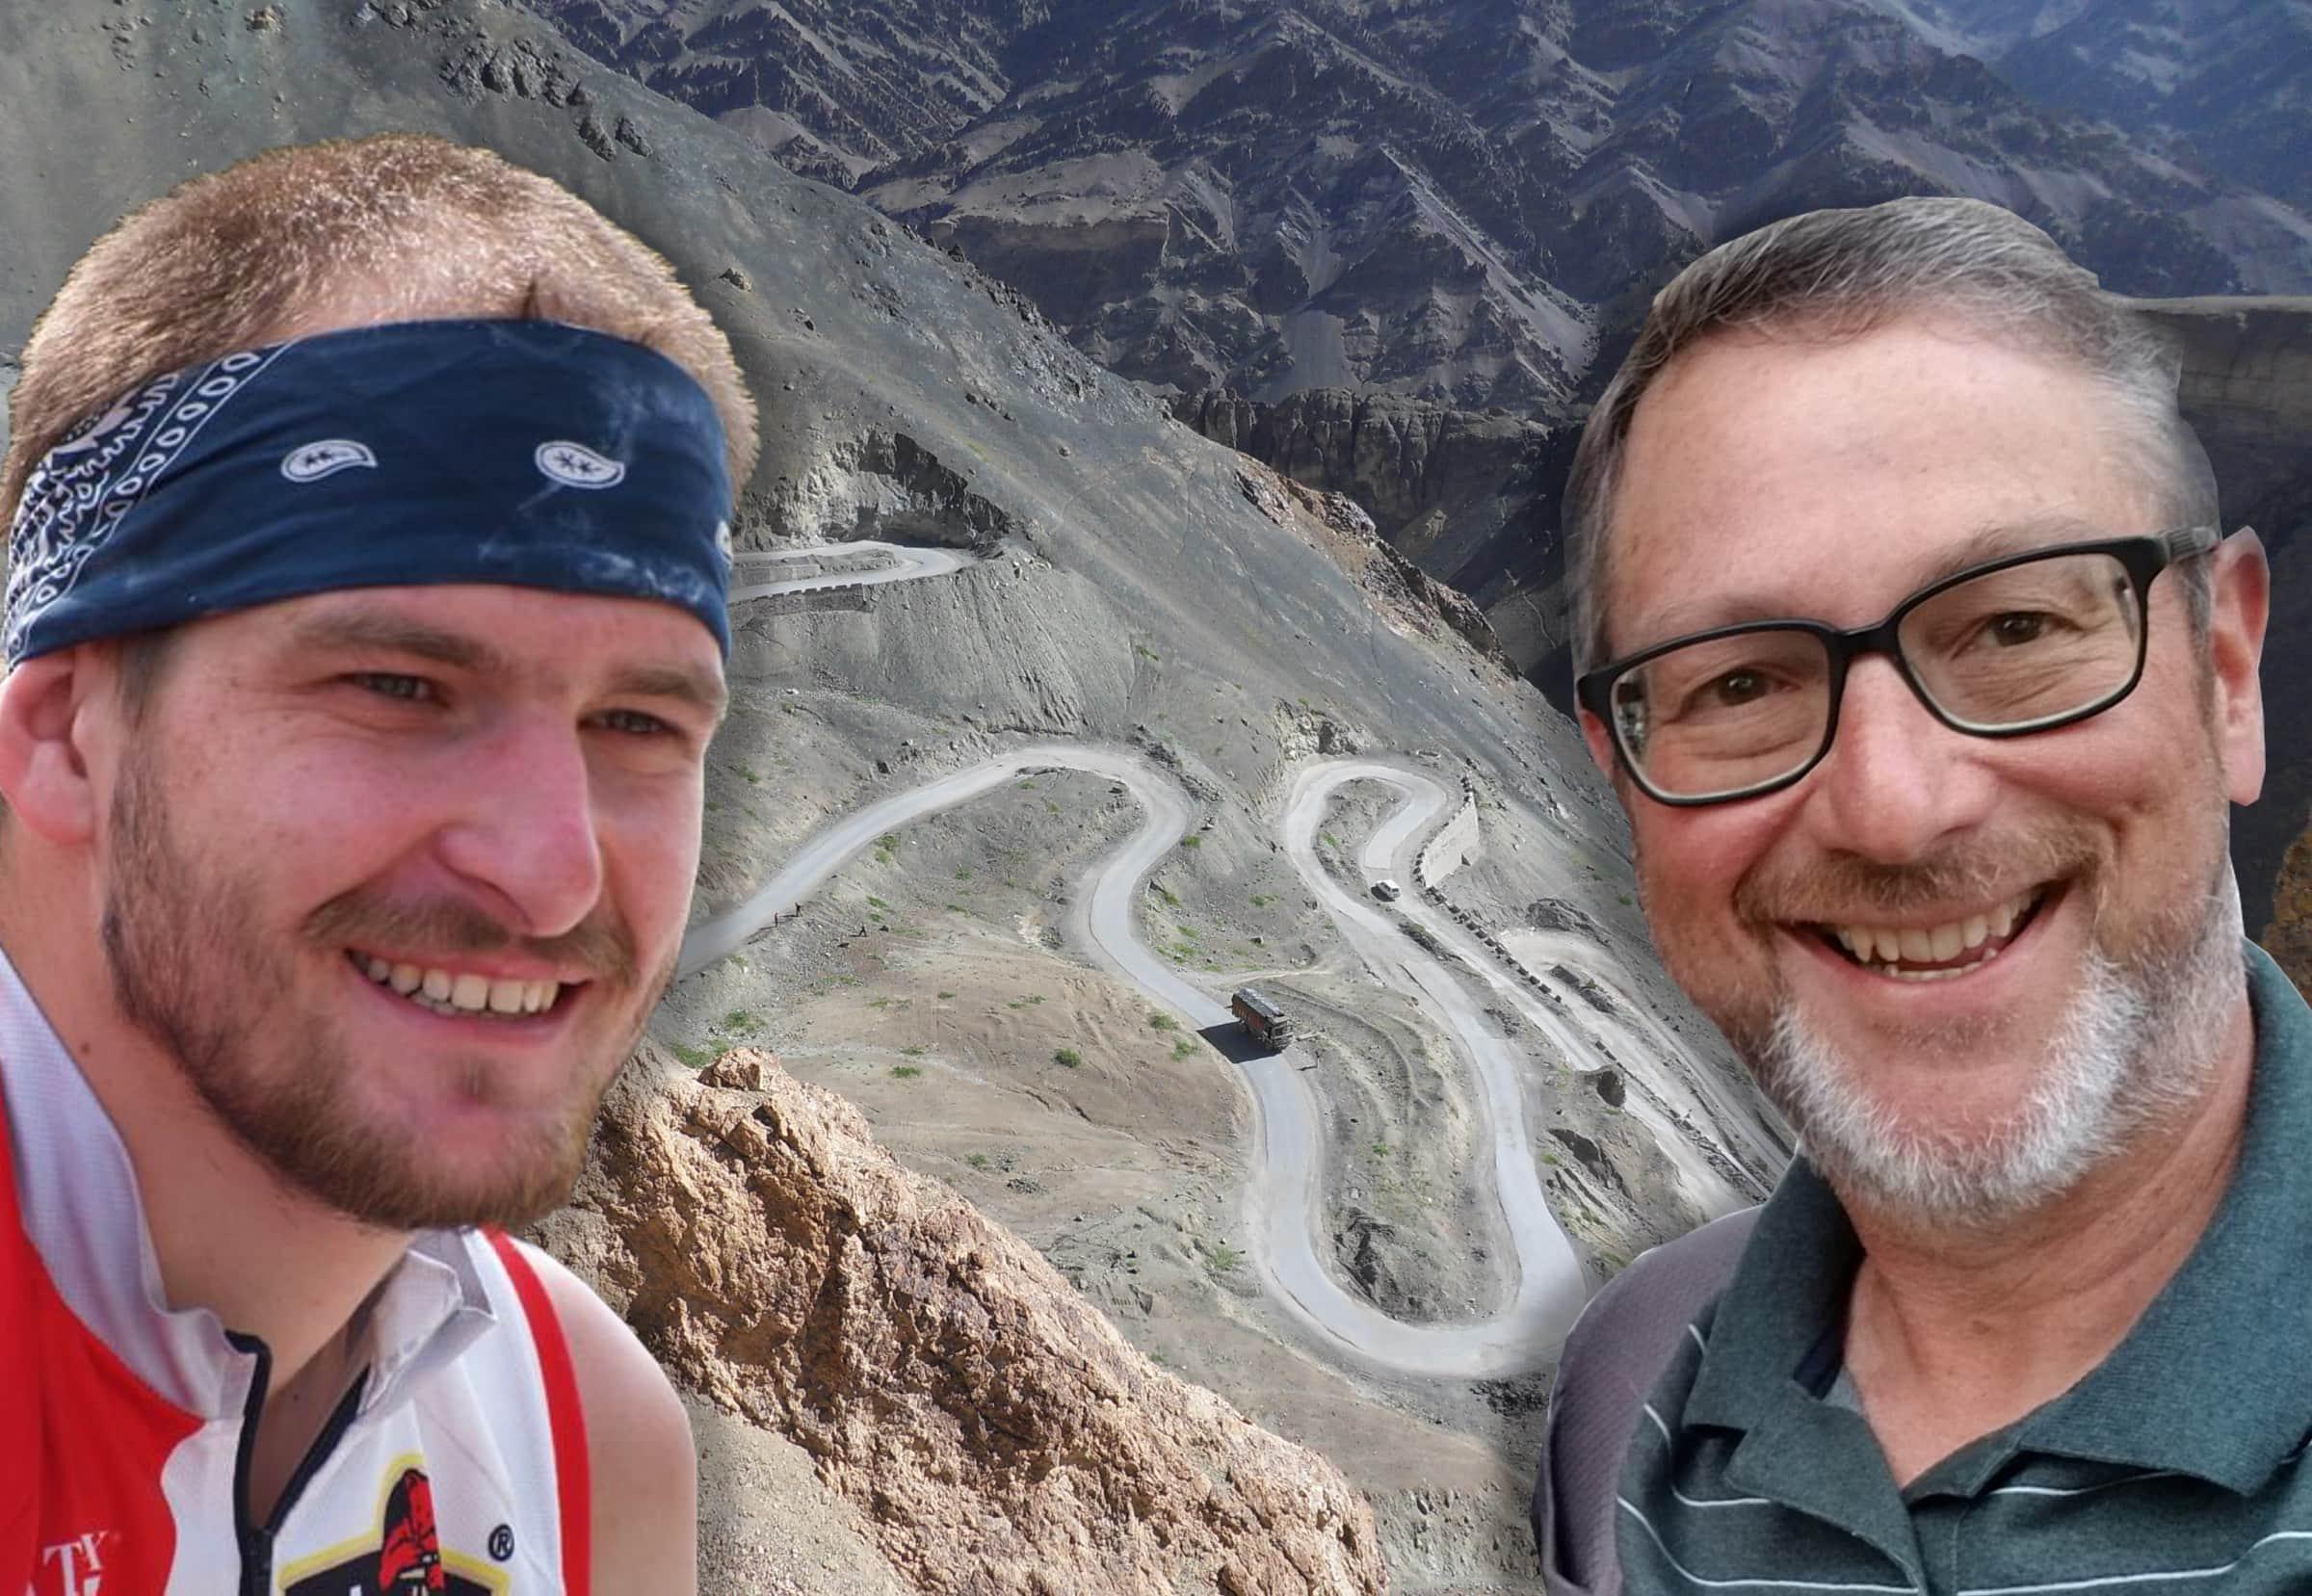 Honza at Laidback Bike Report